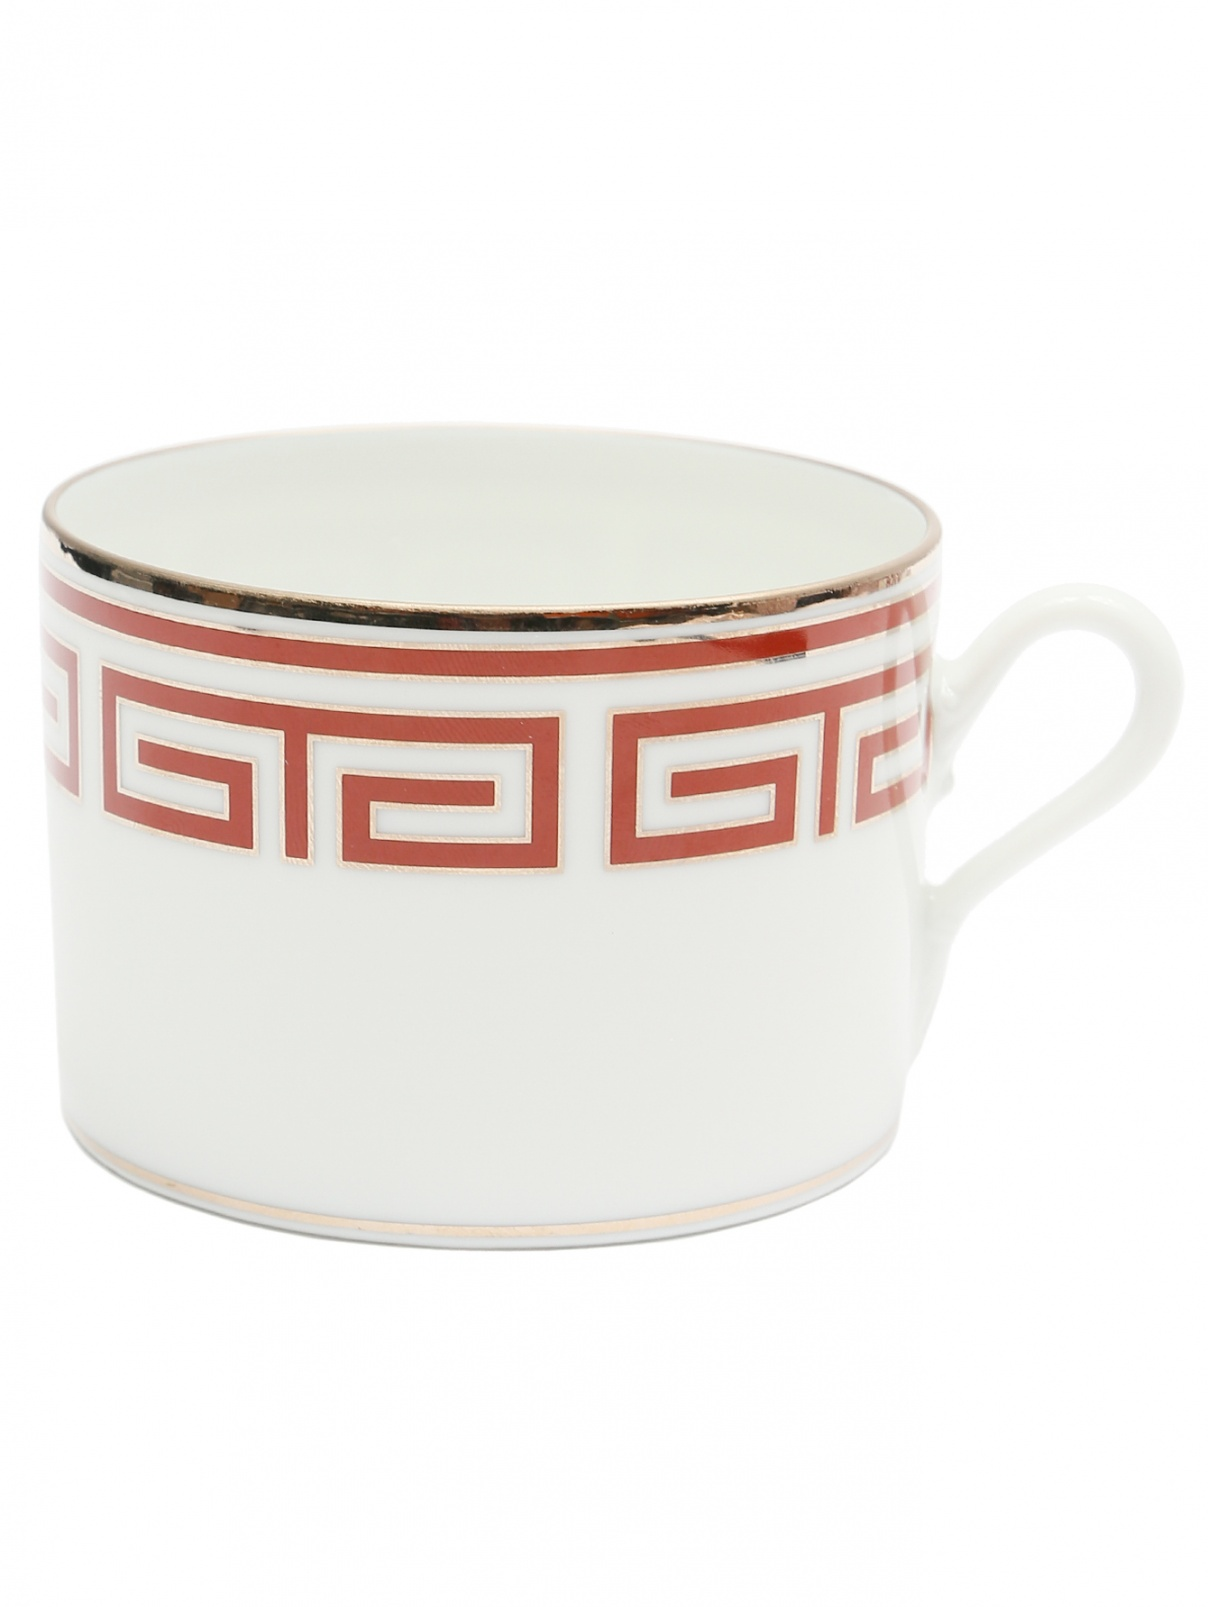 Чайная чашка 8 x 5.5 Richard Ginori 1735  –  Общий вид